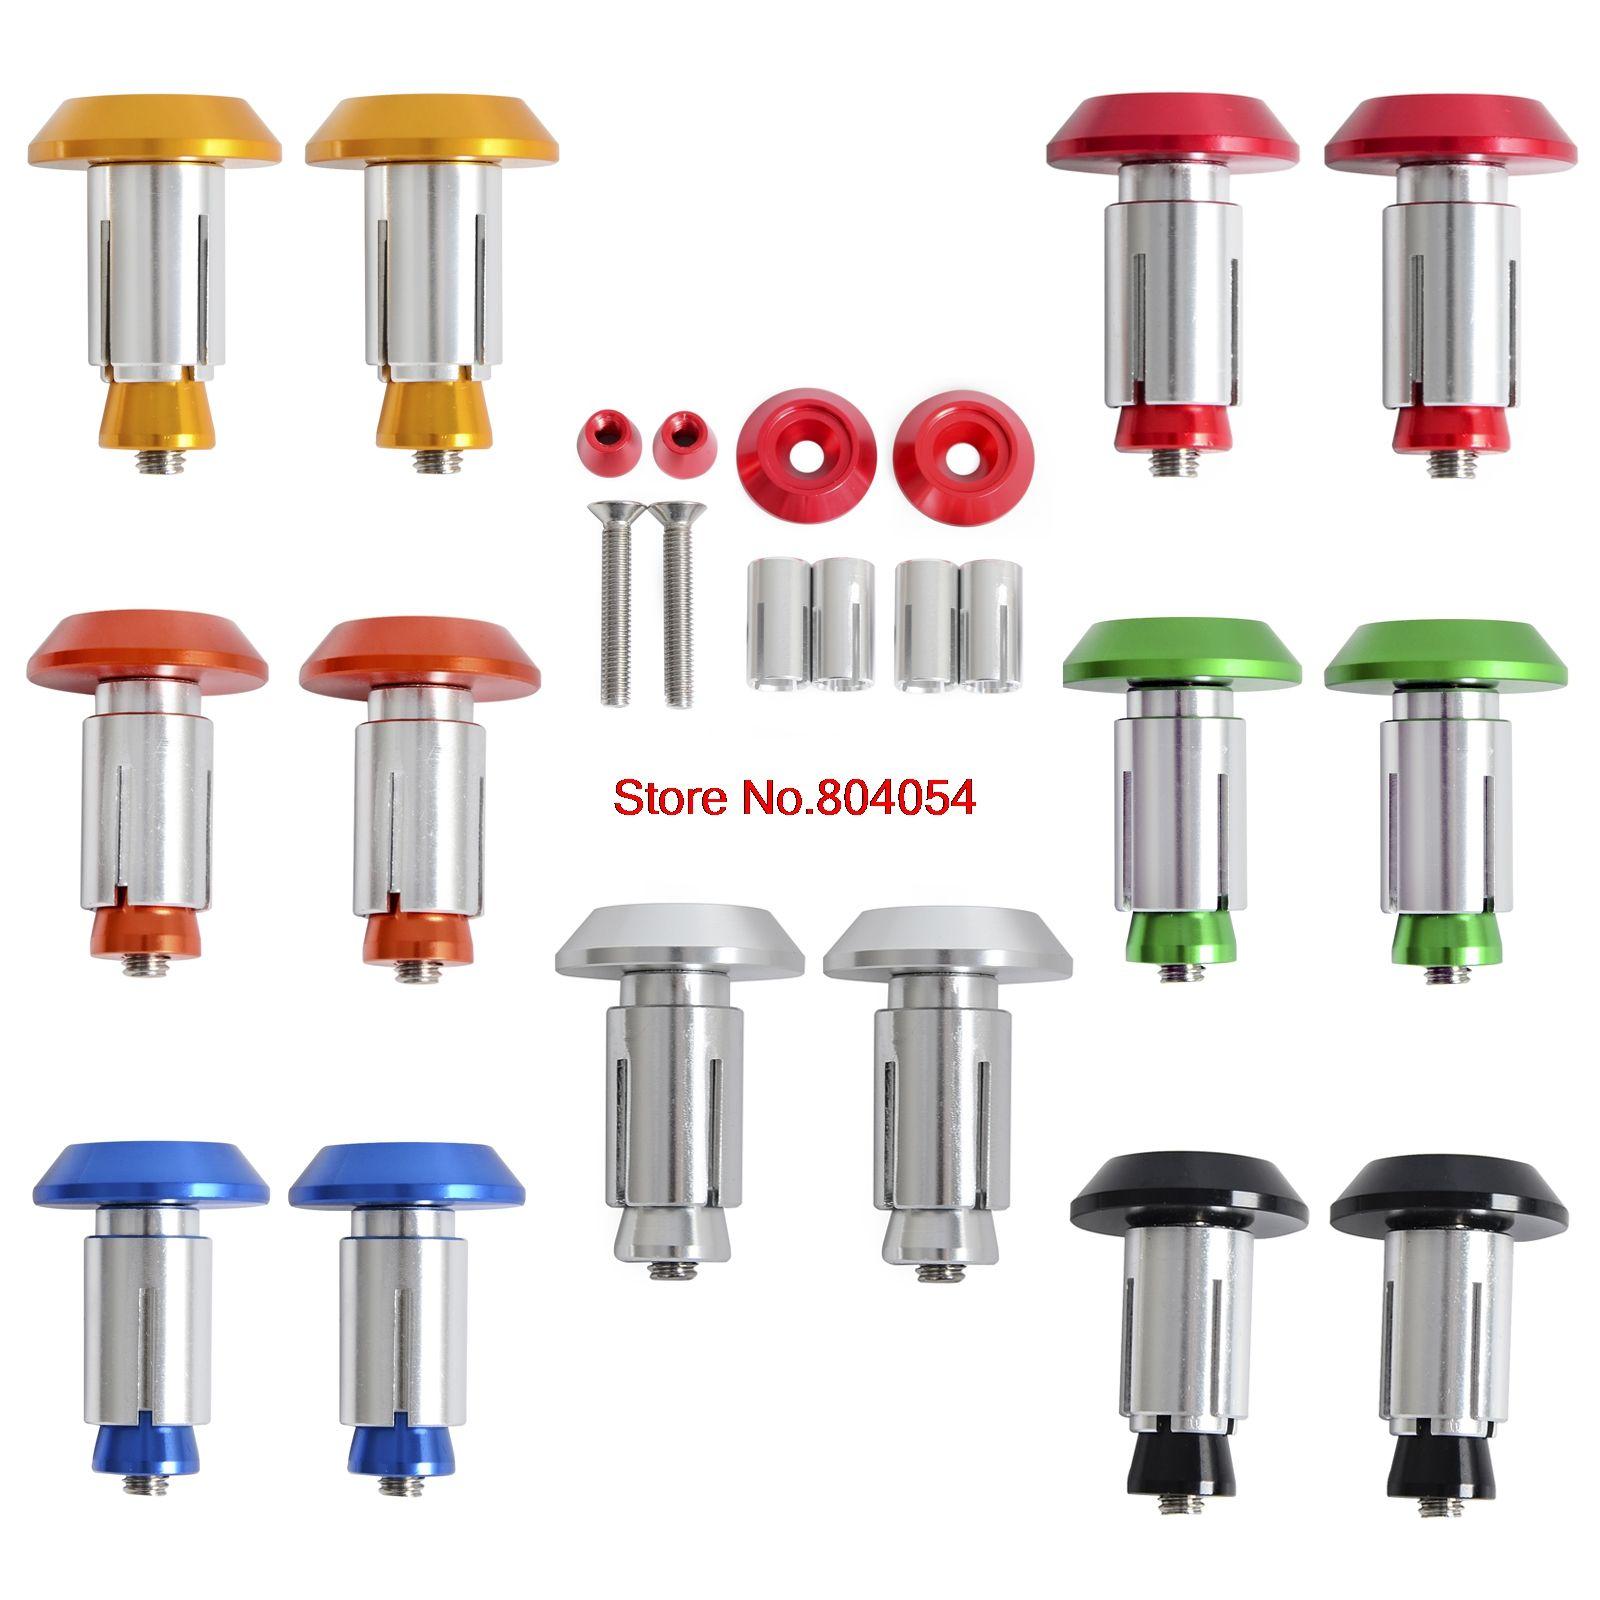 CNC Billet Handlebar Cap Plugs for Suzuki RM65 RM85 RM100